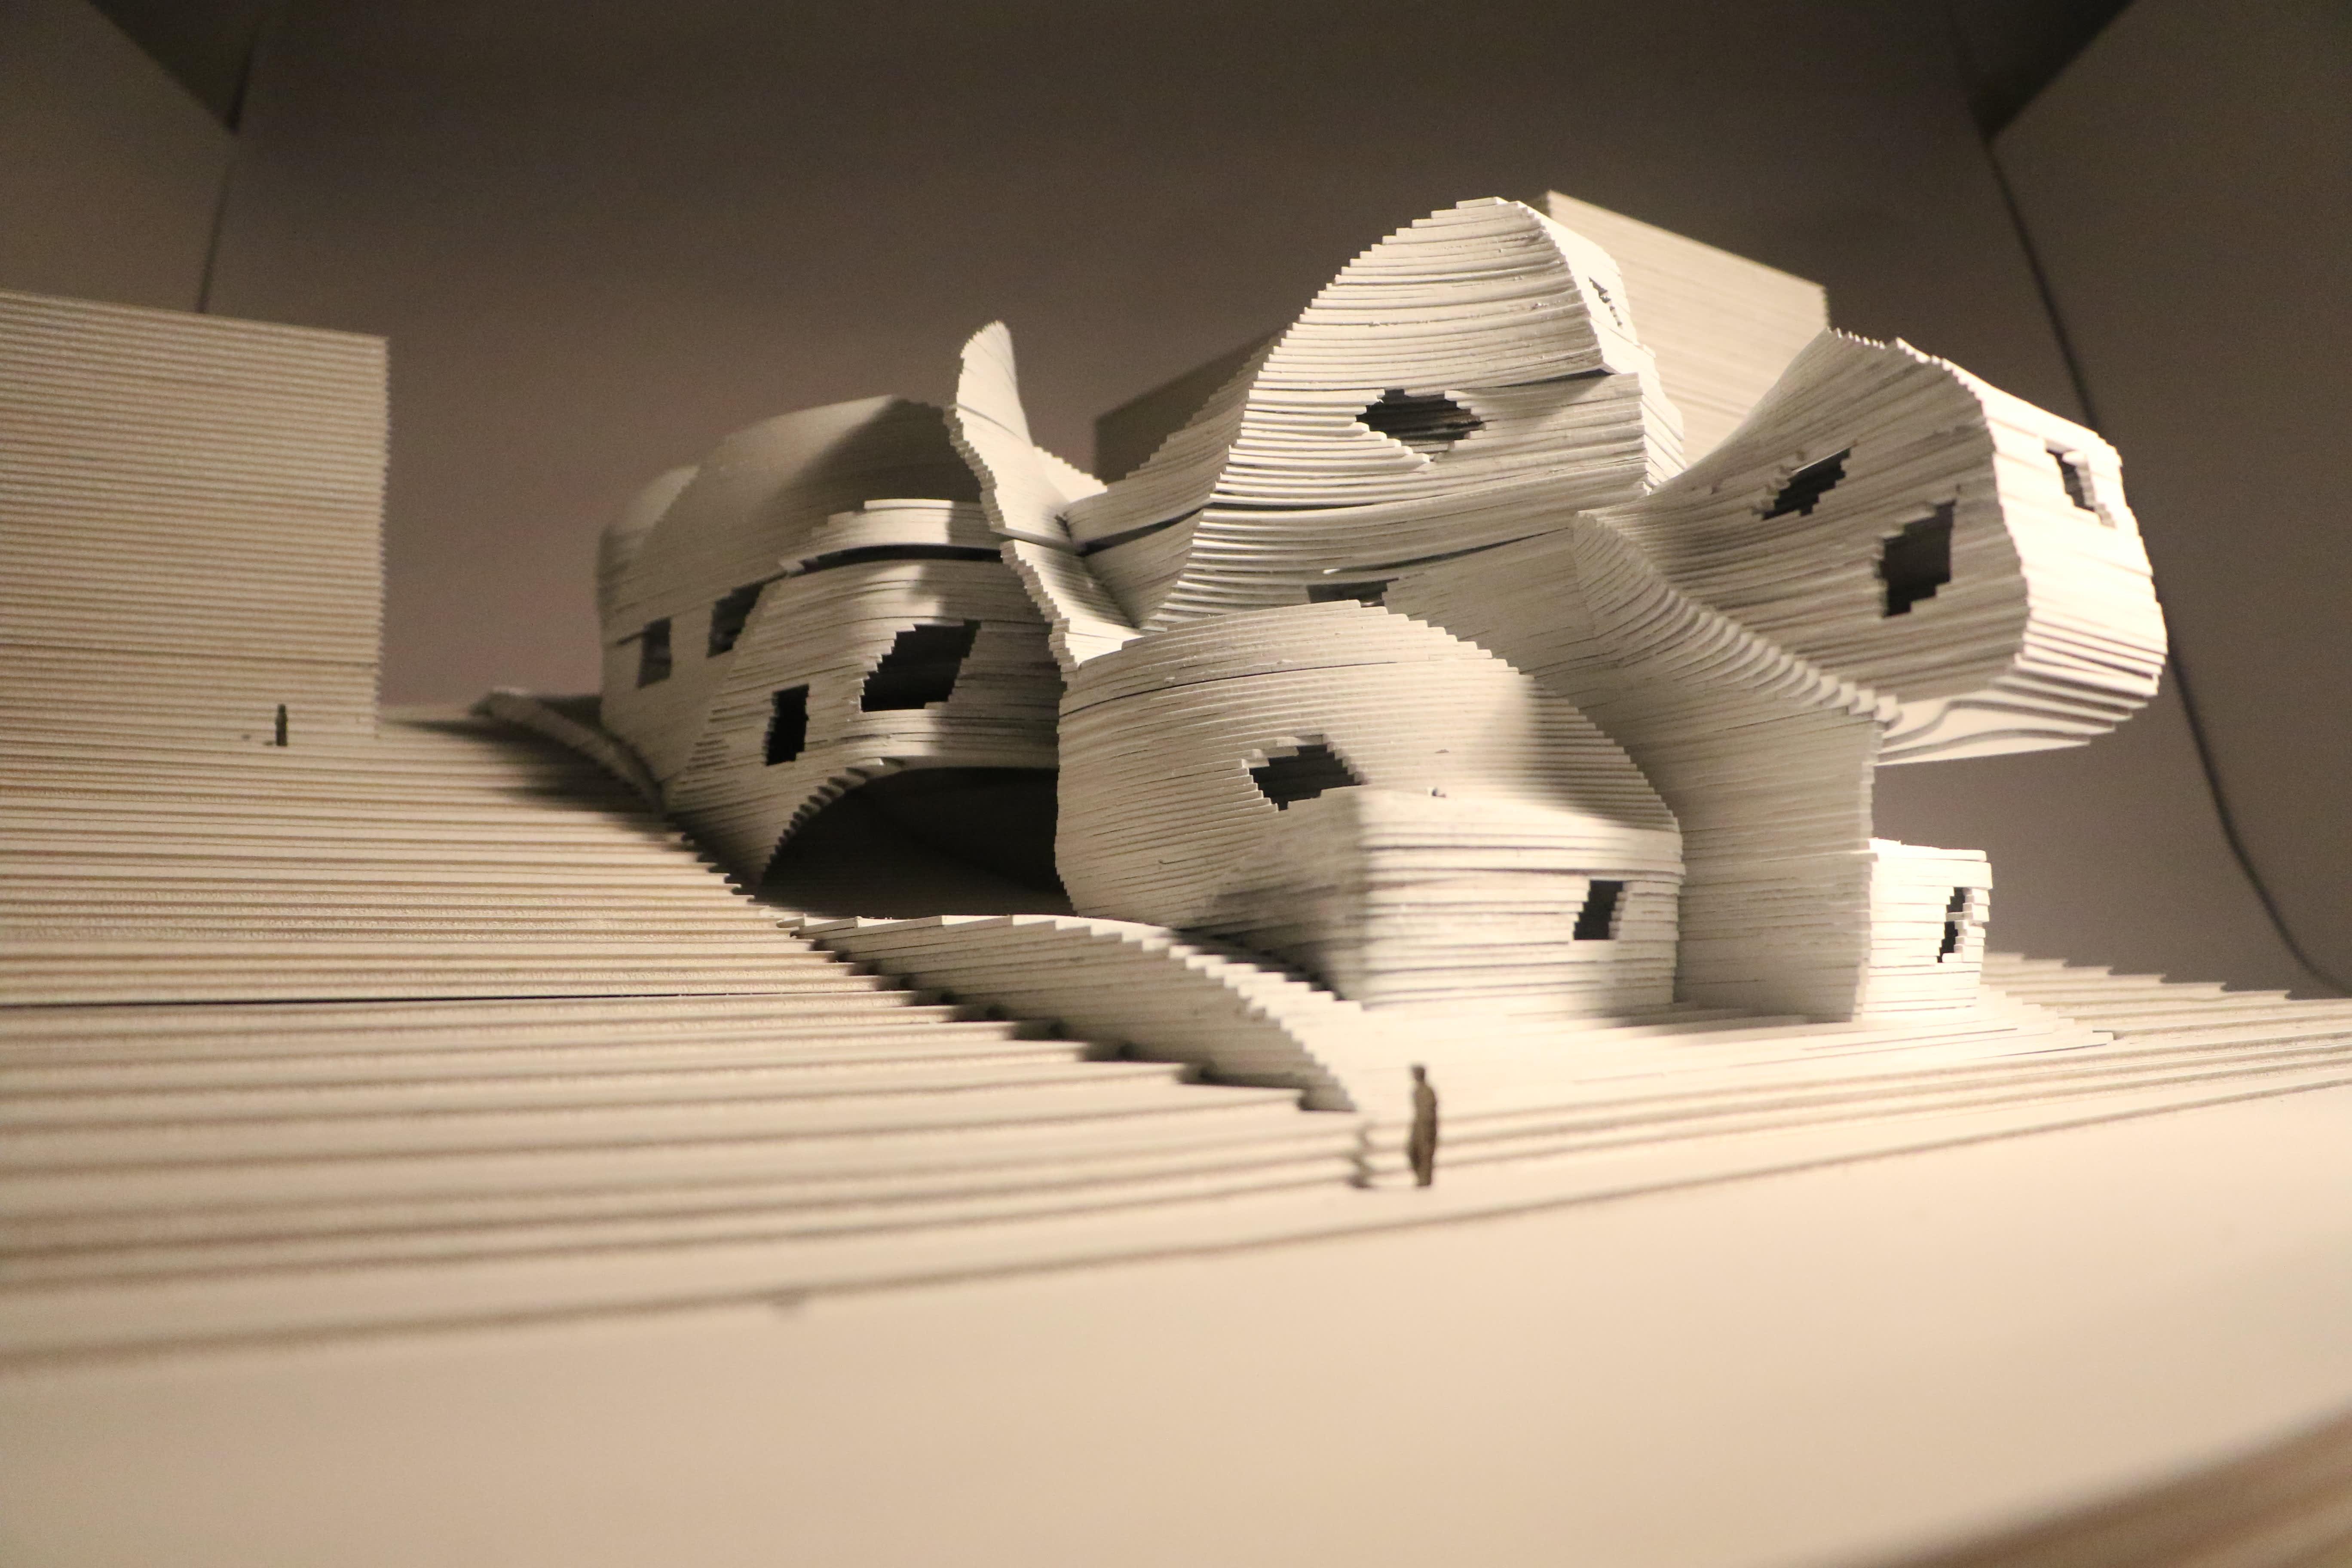 Kindergarten architectural model